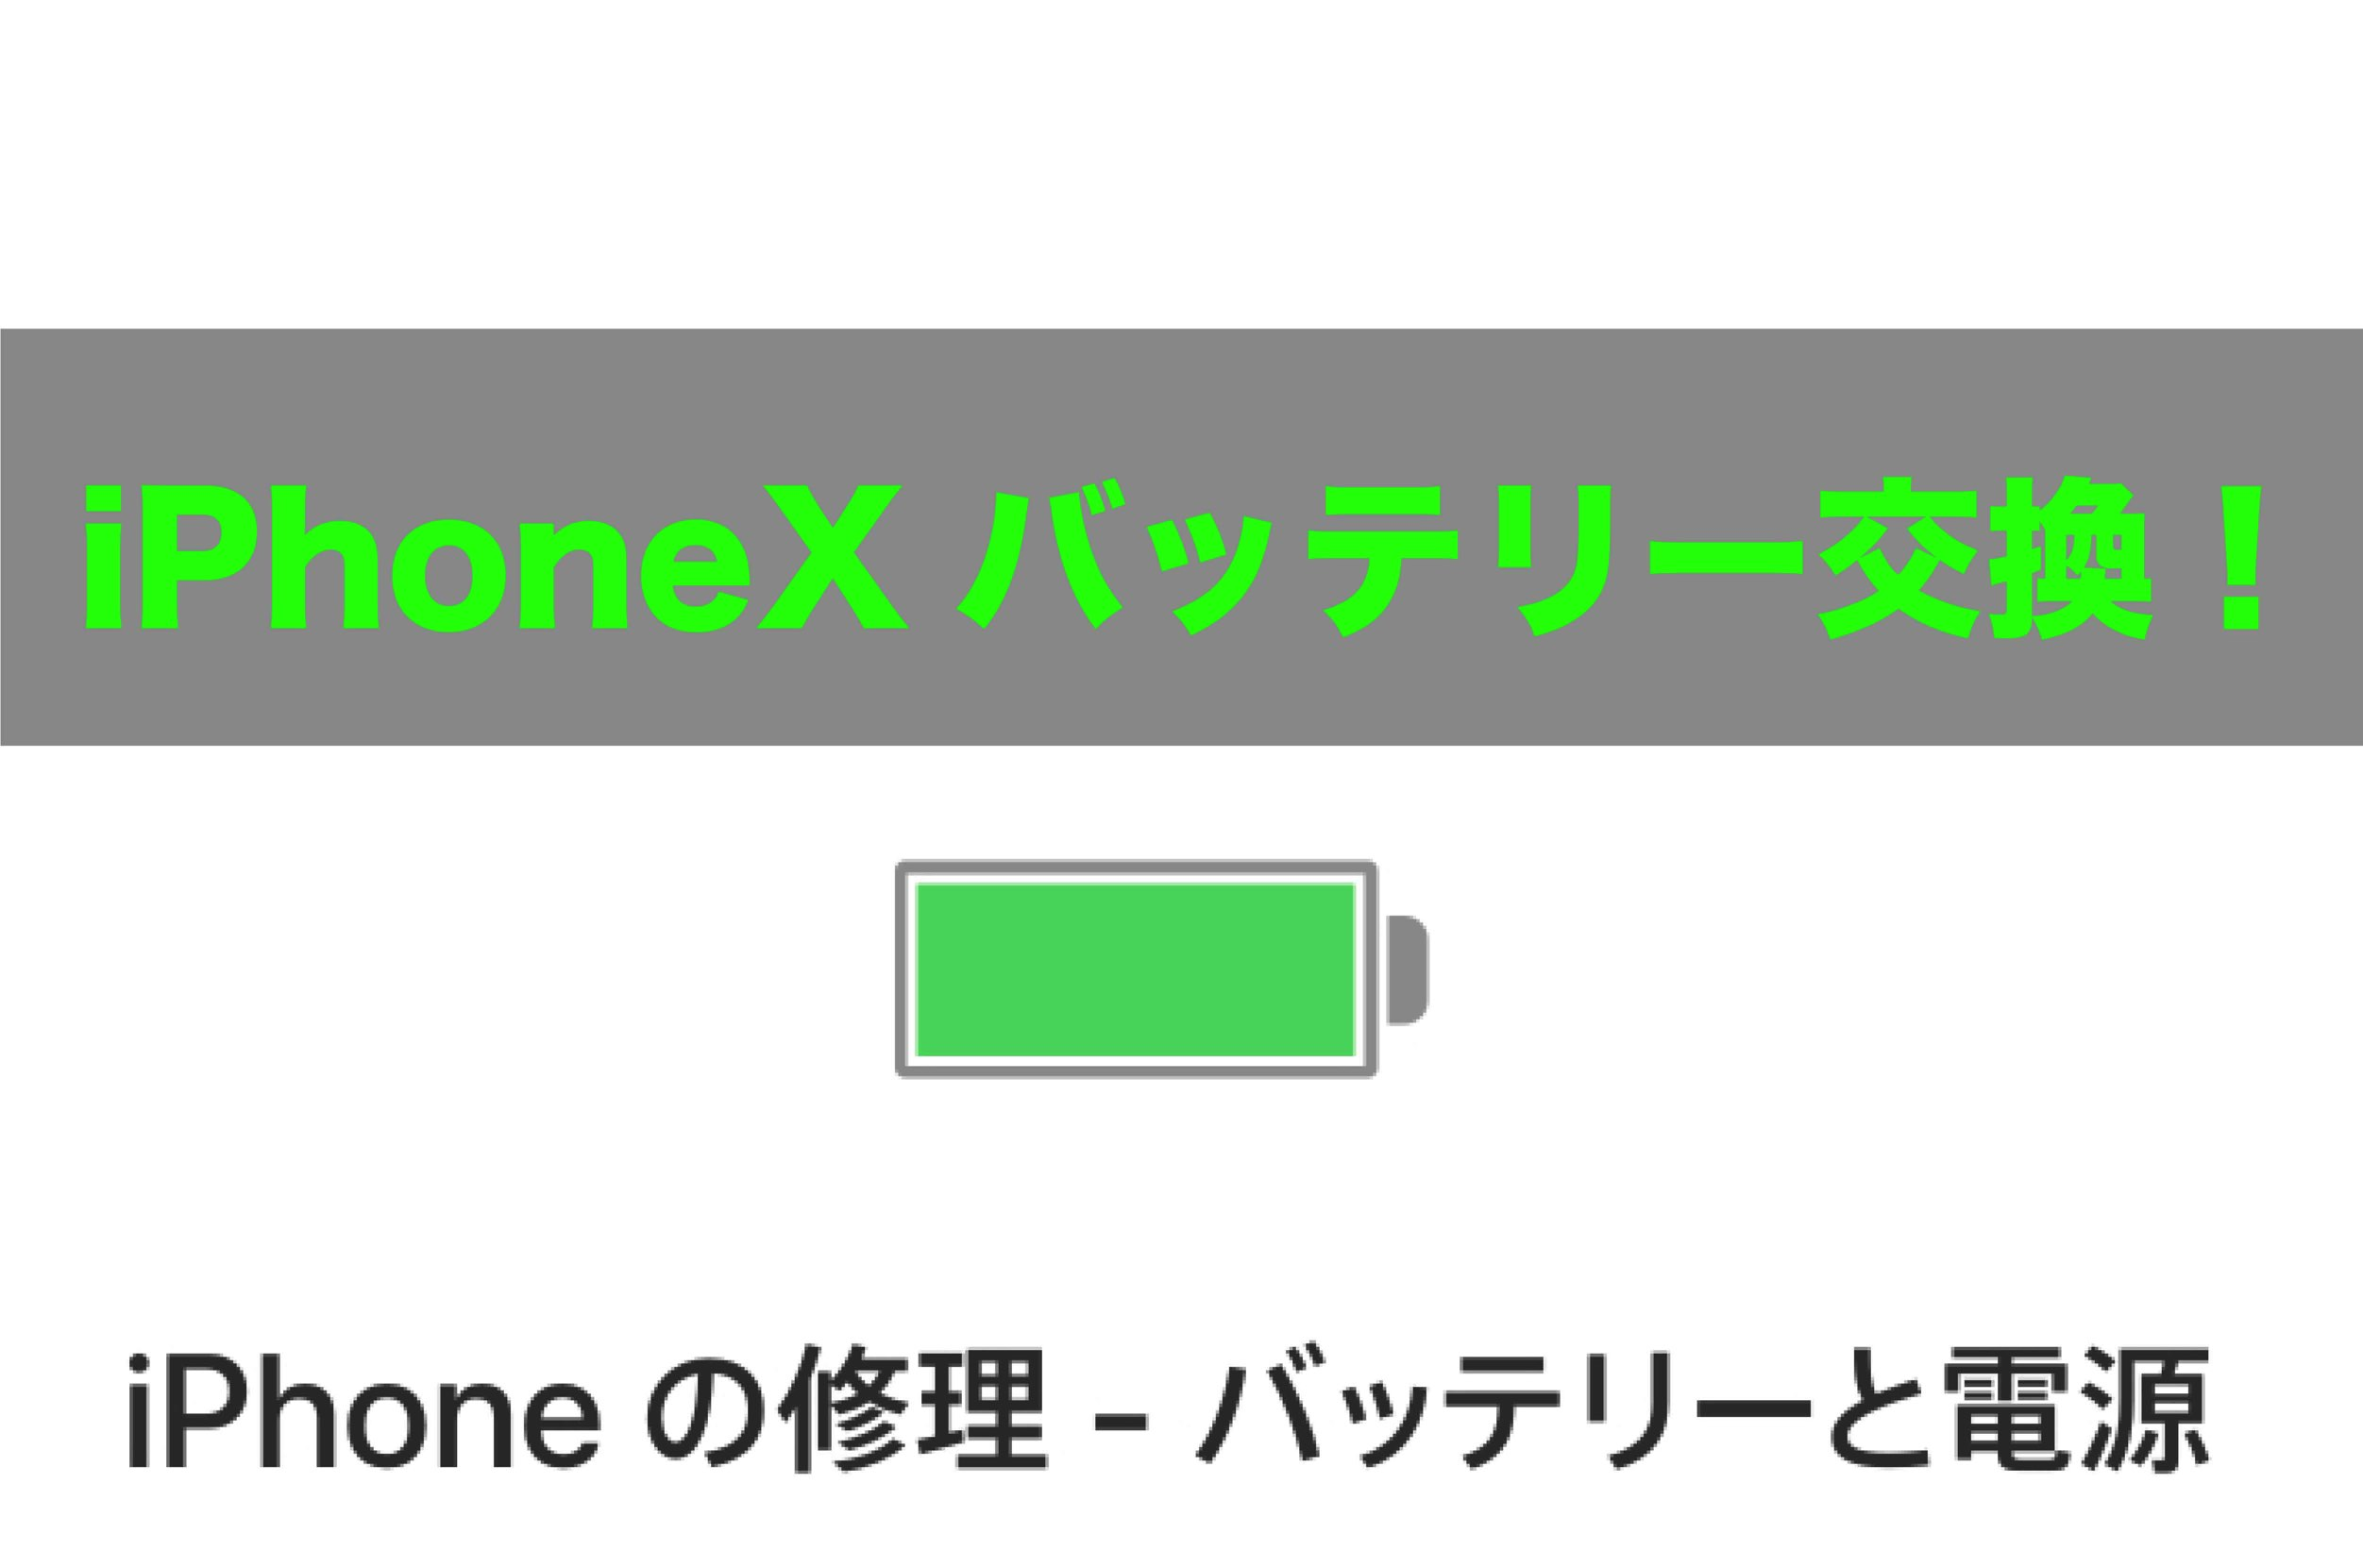 iPhoneXを高く売りたいので無料のバッテリー交換プログラムを利用しました!